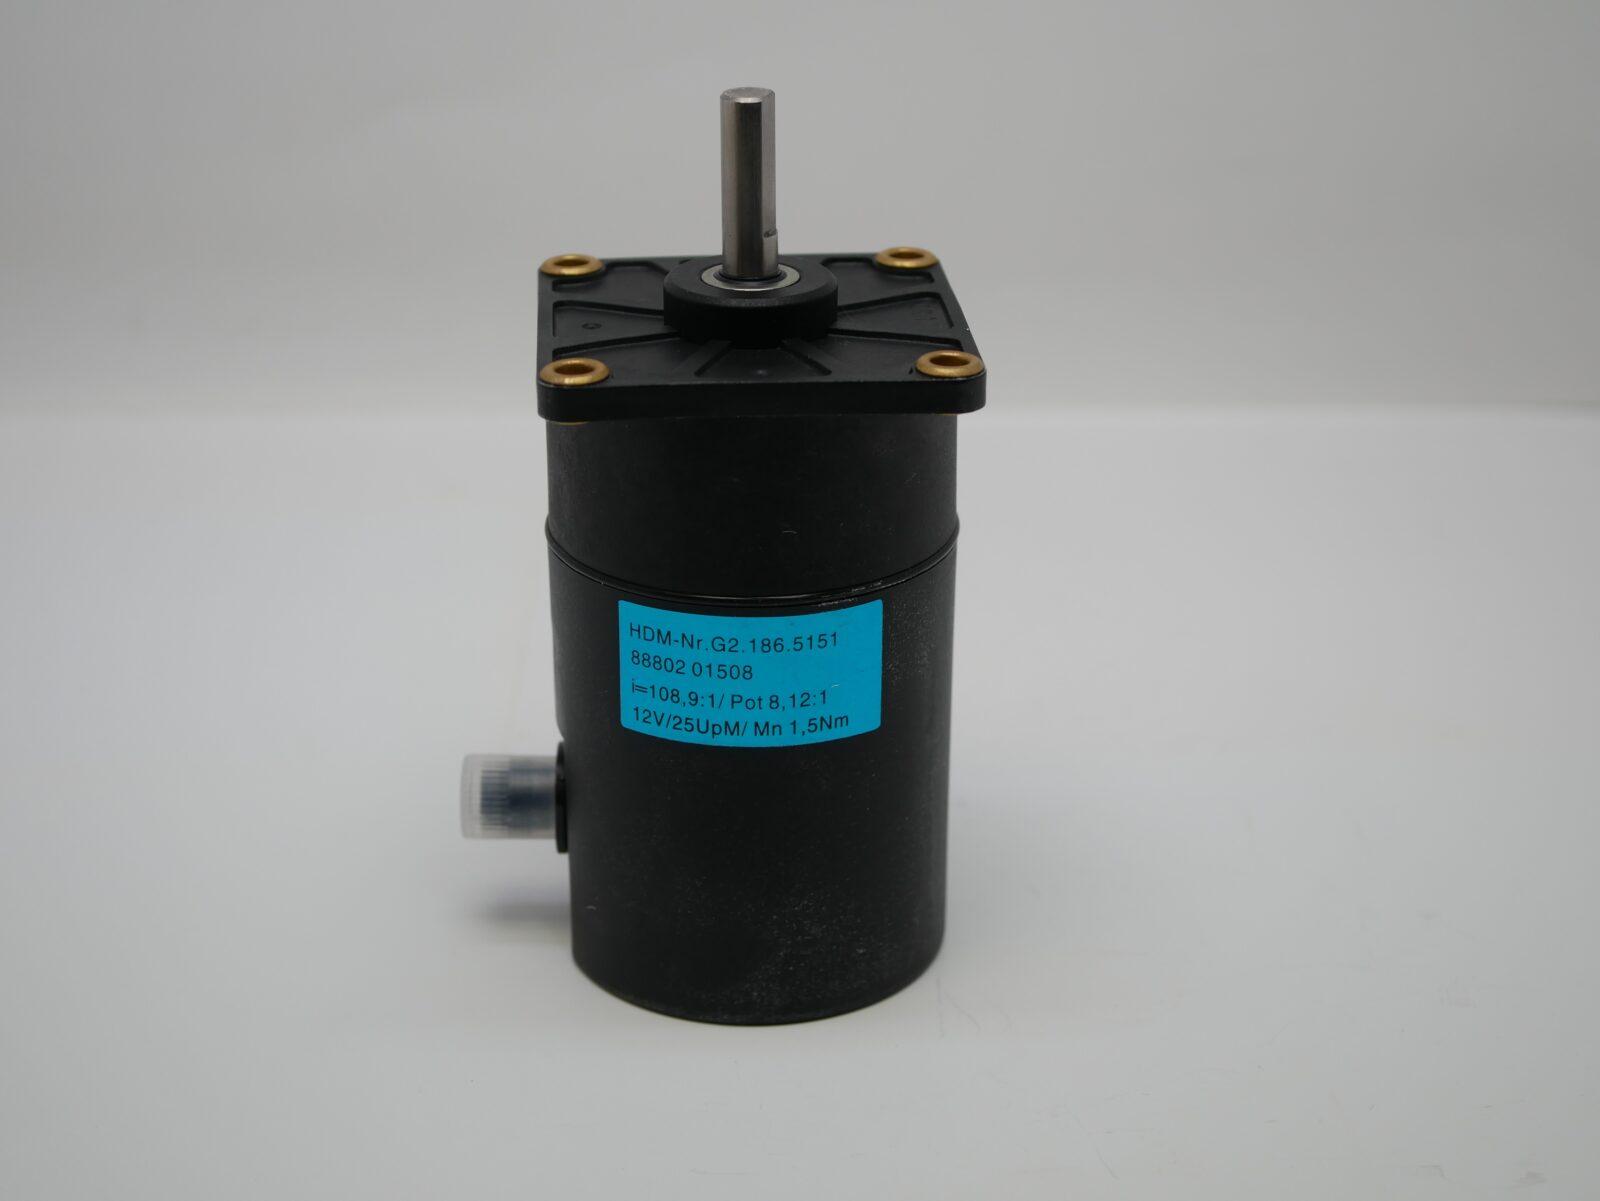 SM52 Servo Drive Motor (Light Blue) HDM: G2.186.5151